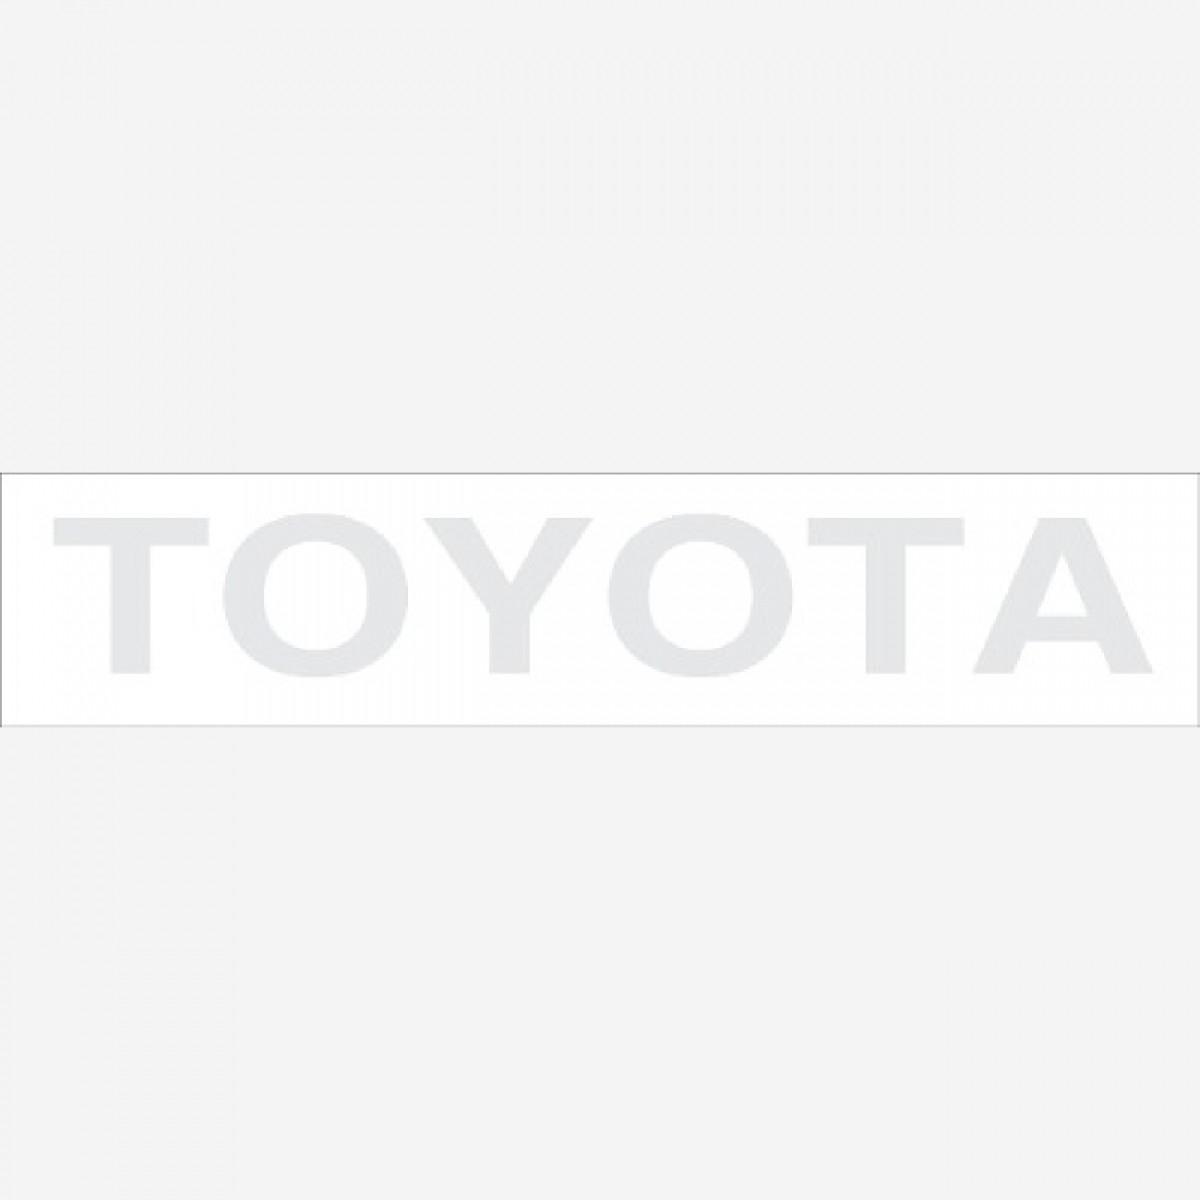 Adesivo Toyota Traseiro Hilux Em Cinza Claro Decalx